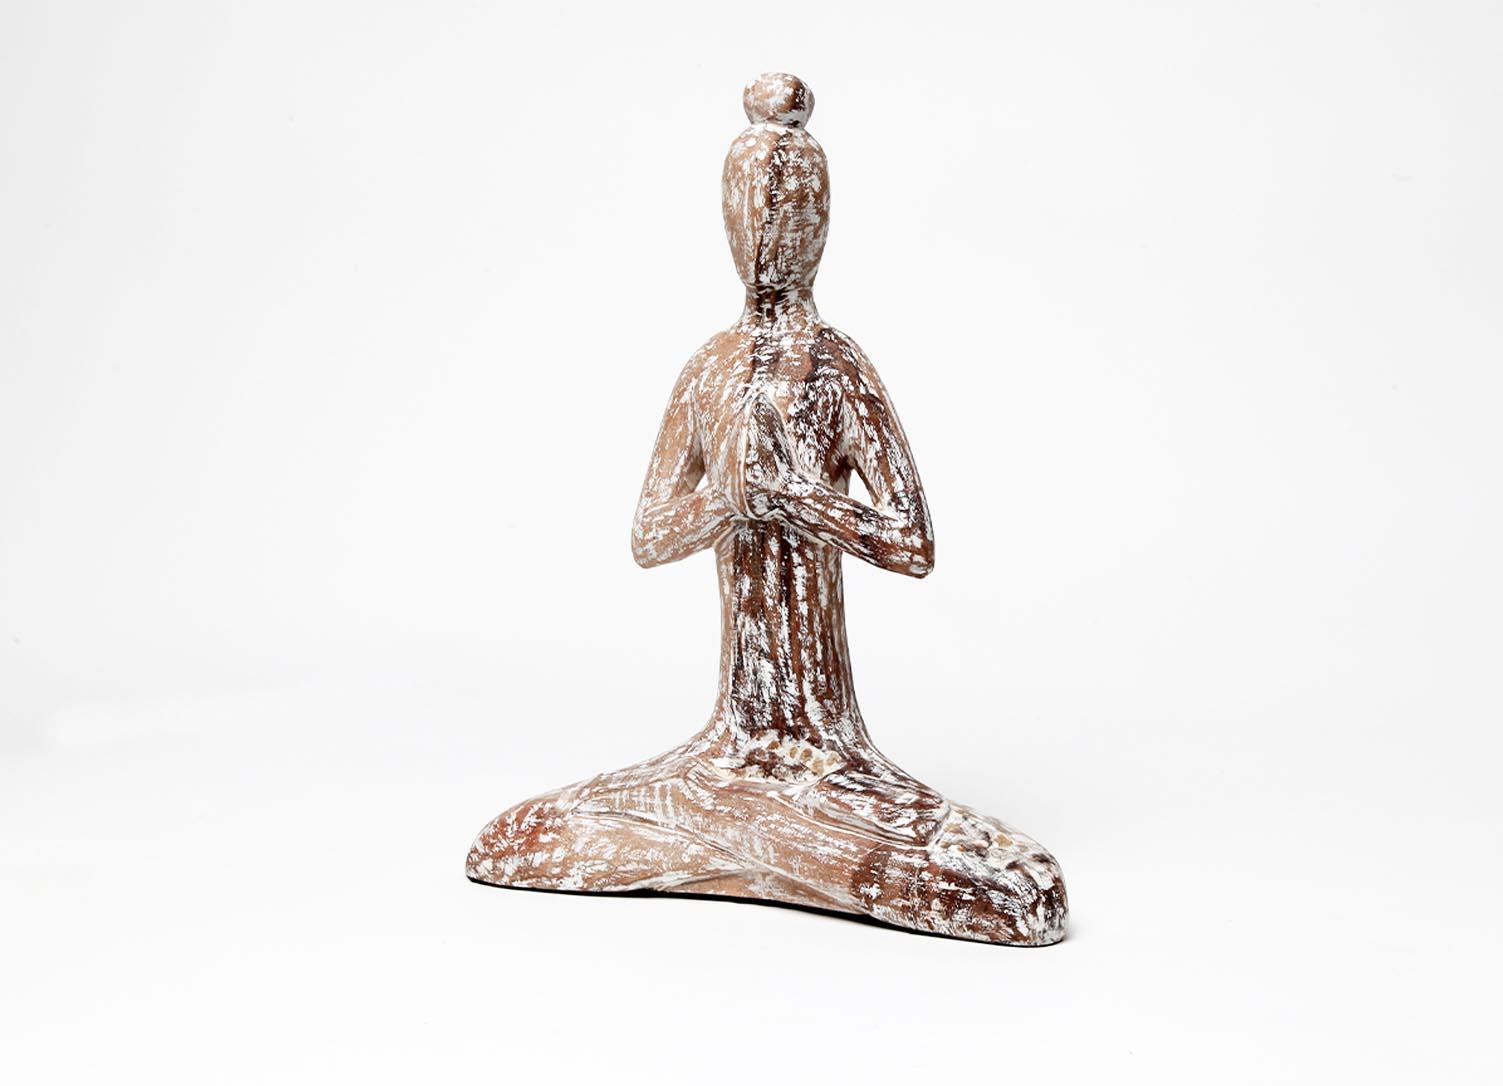 Exner Holz Skulptur Artisanal Yoga Dekofigur Naturholz Massiv Modern Deko Objekt Braun Weiß Natur